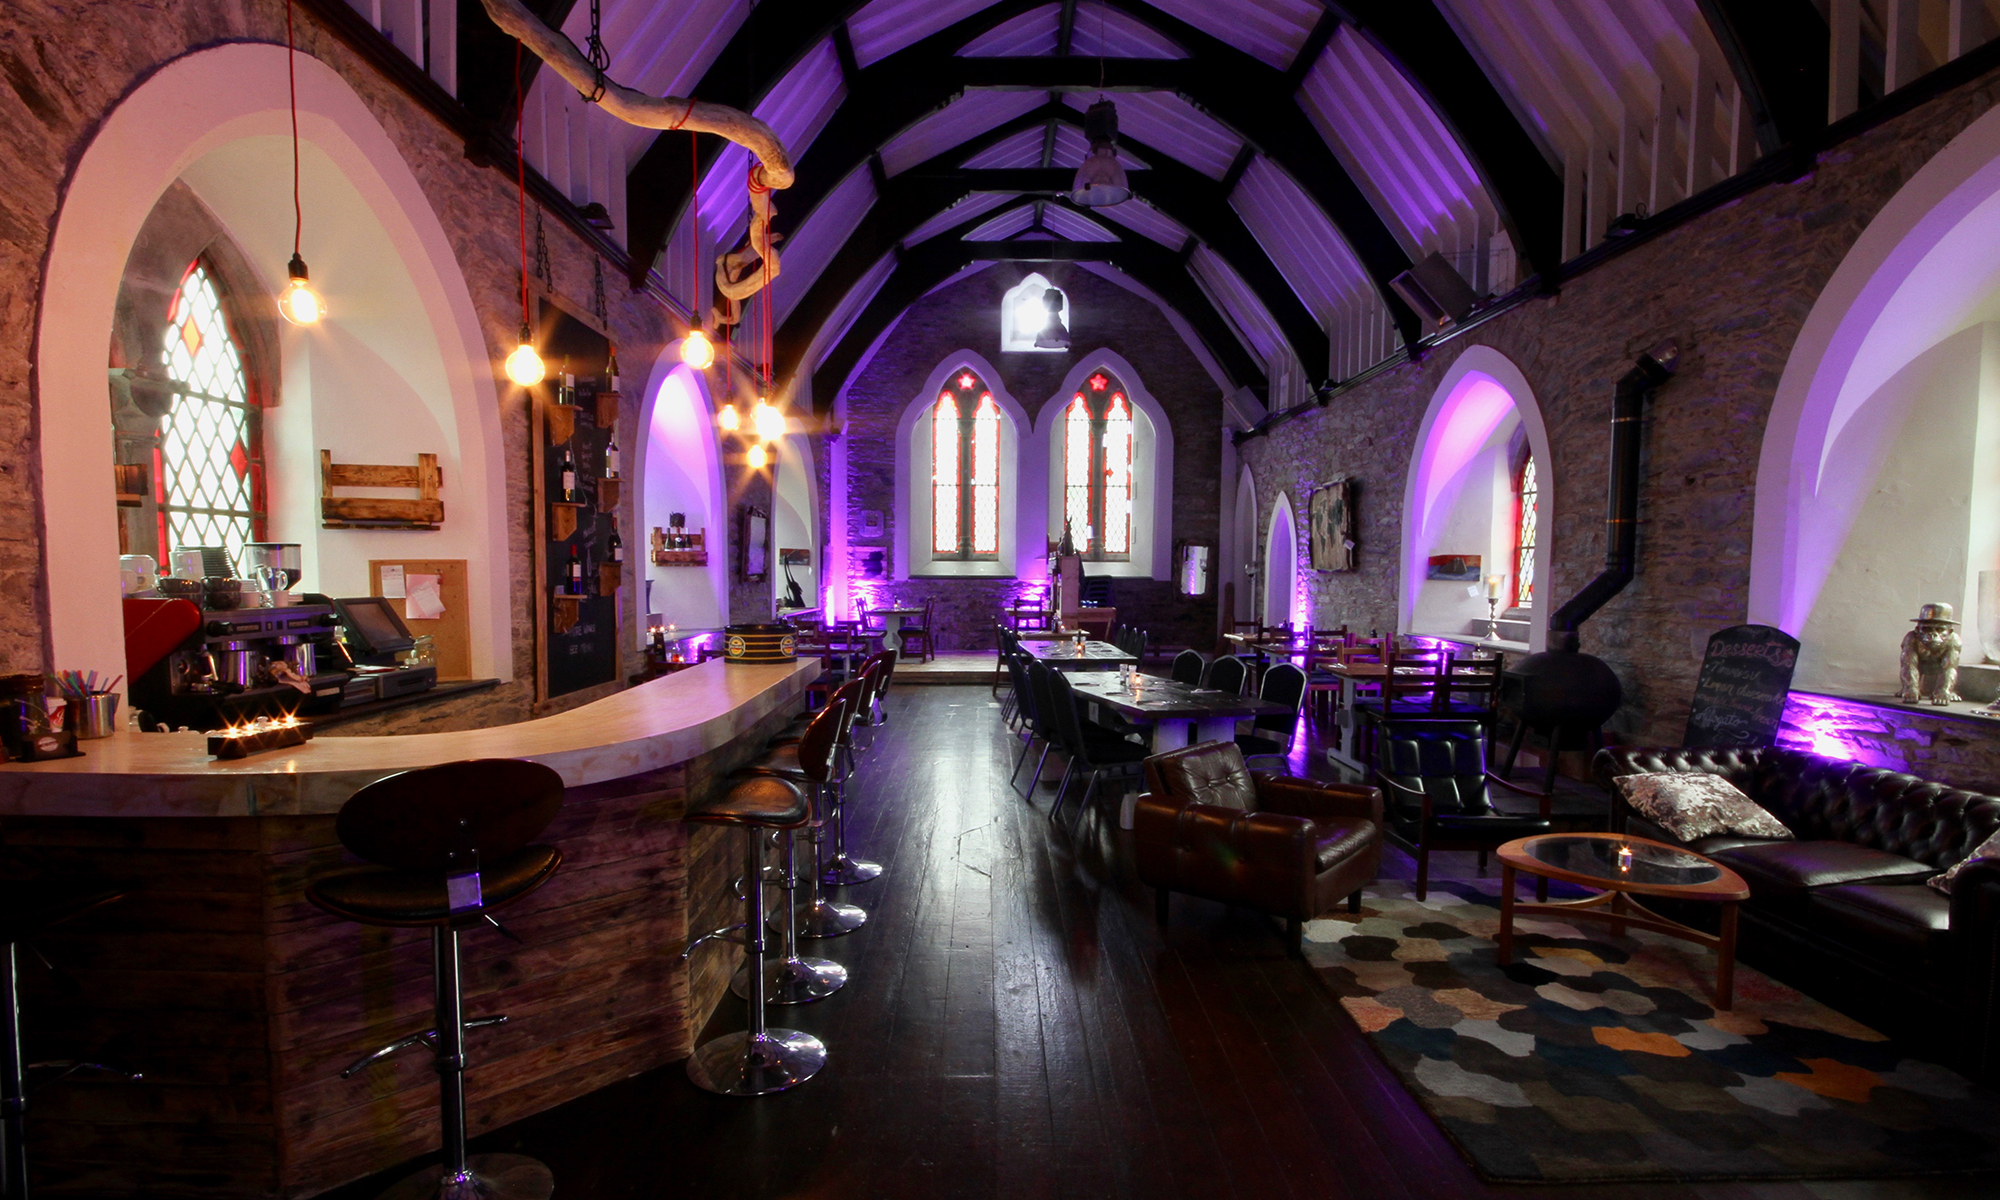 The Oratory Pizza & Wine Bar